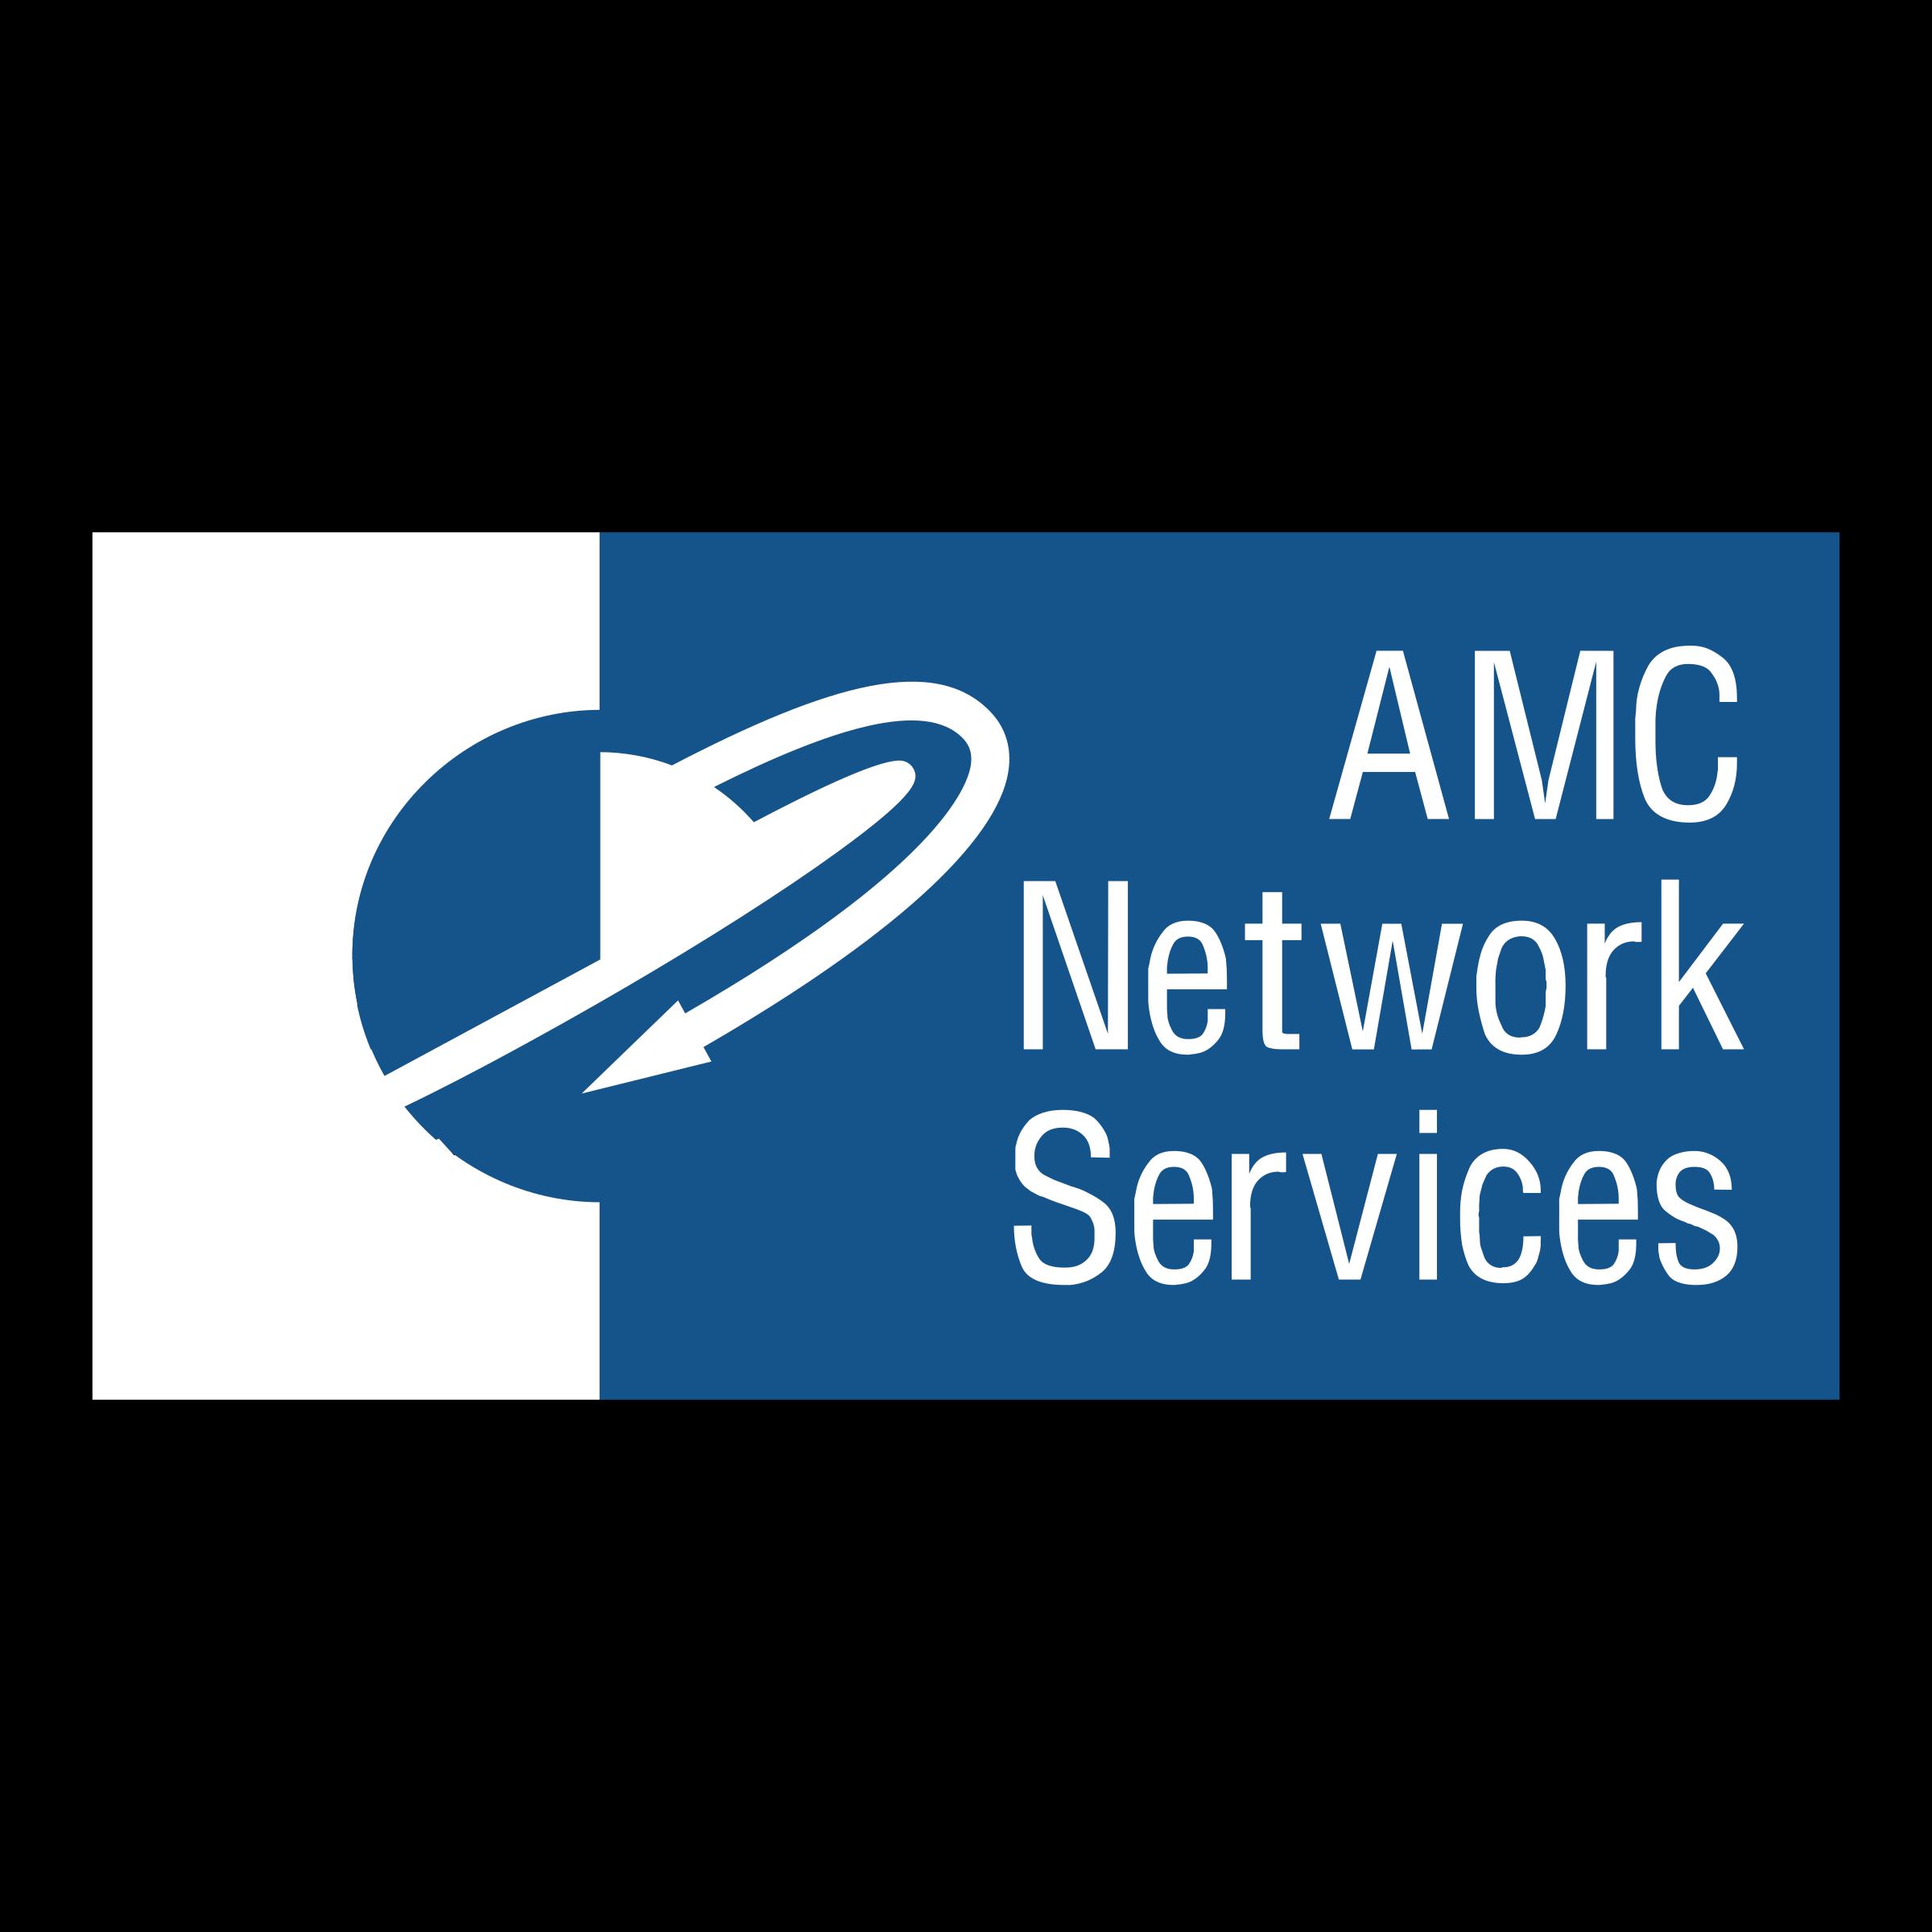 AMC Network Services Logo PNG Transparent